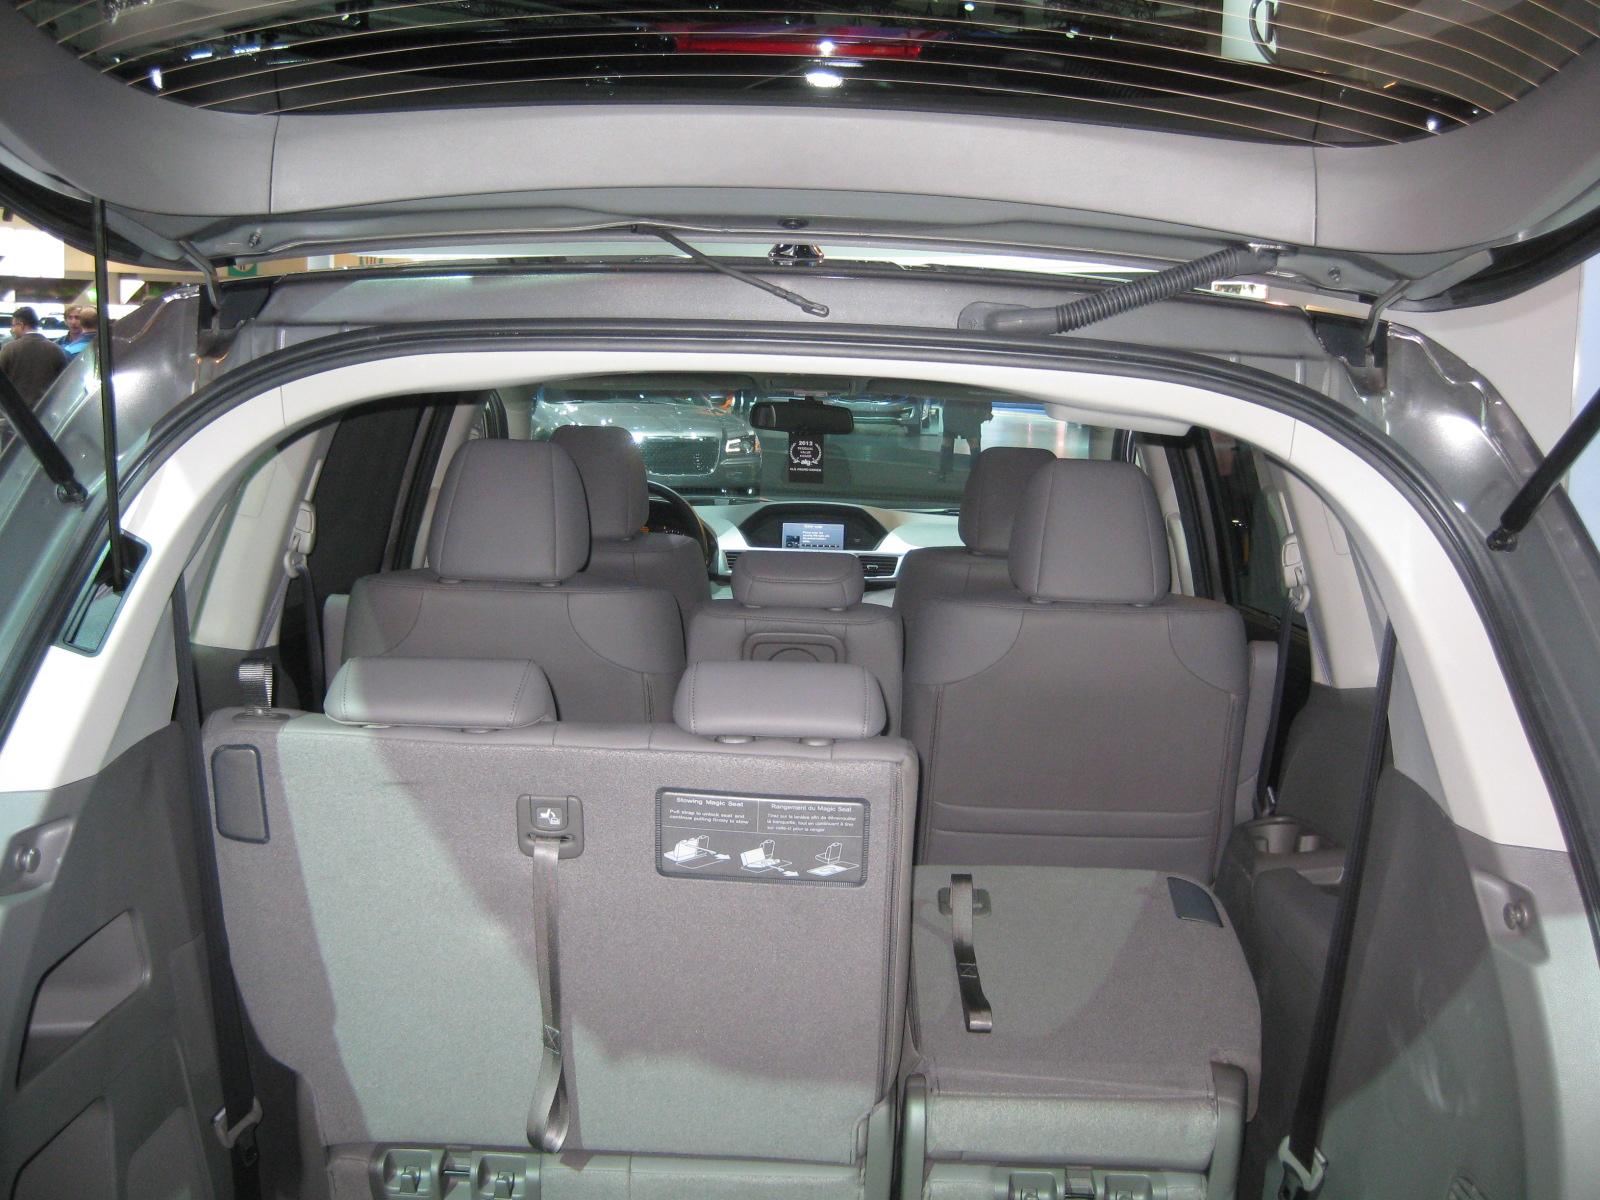 500c gucci edition todd bianco 39 s acarisnotarefrigerator for Honda accord cargo space